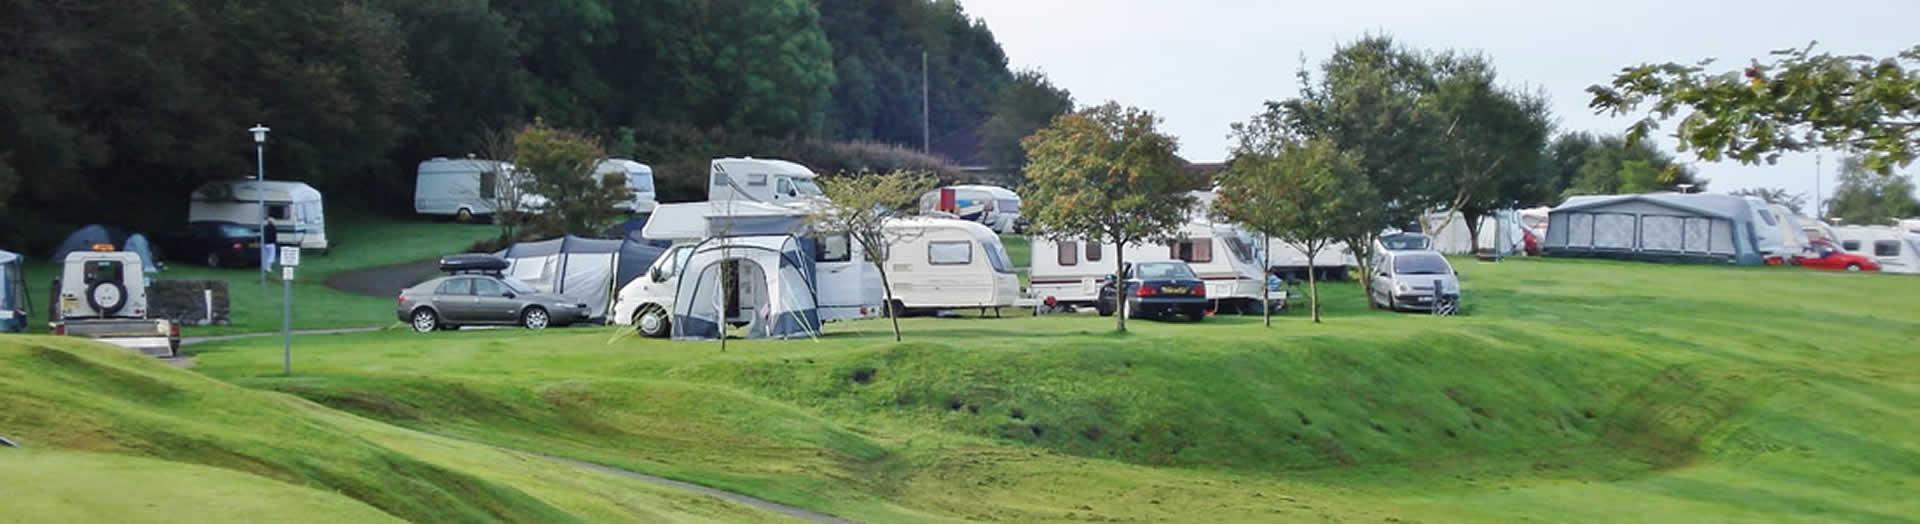 Silvercraigs Caravan Park Kirkcudbright